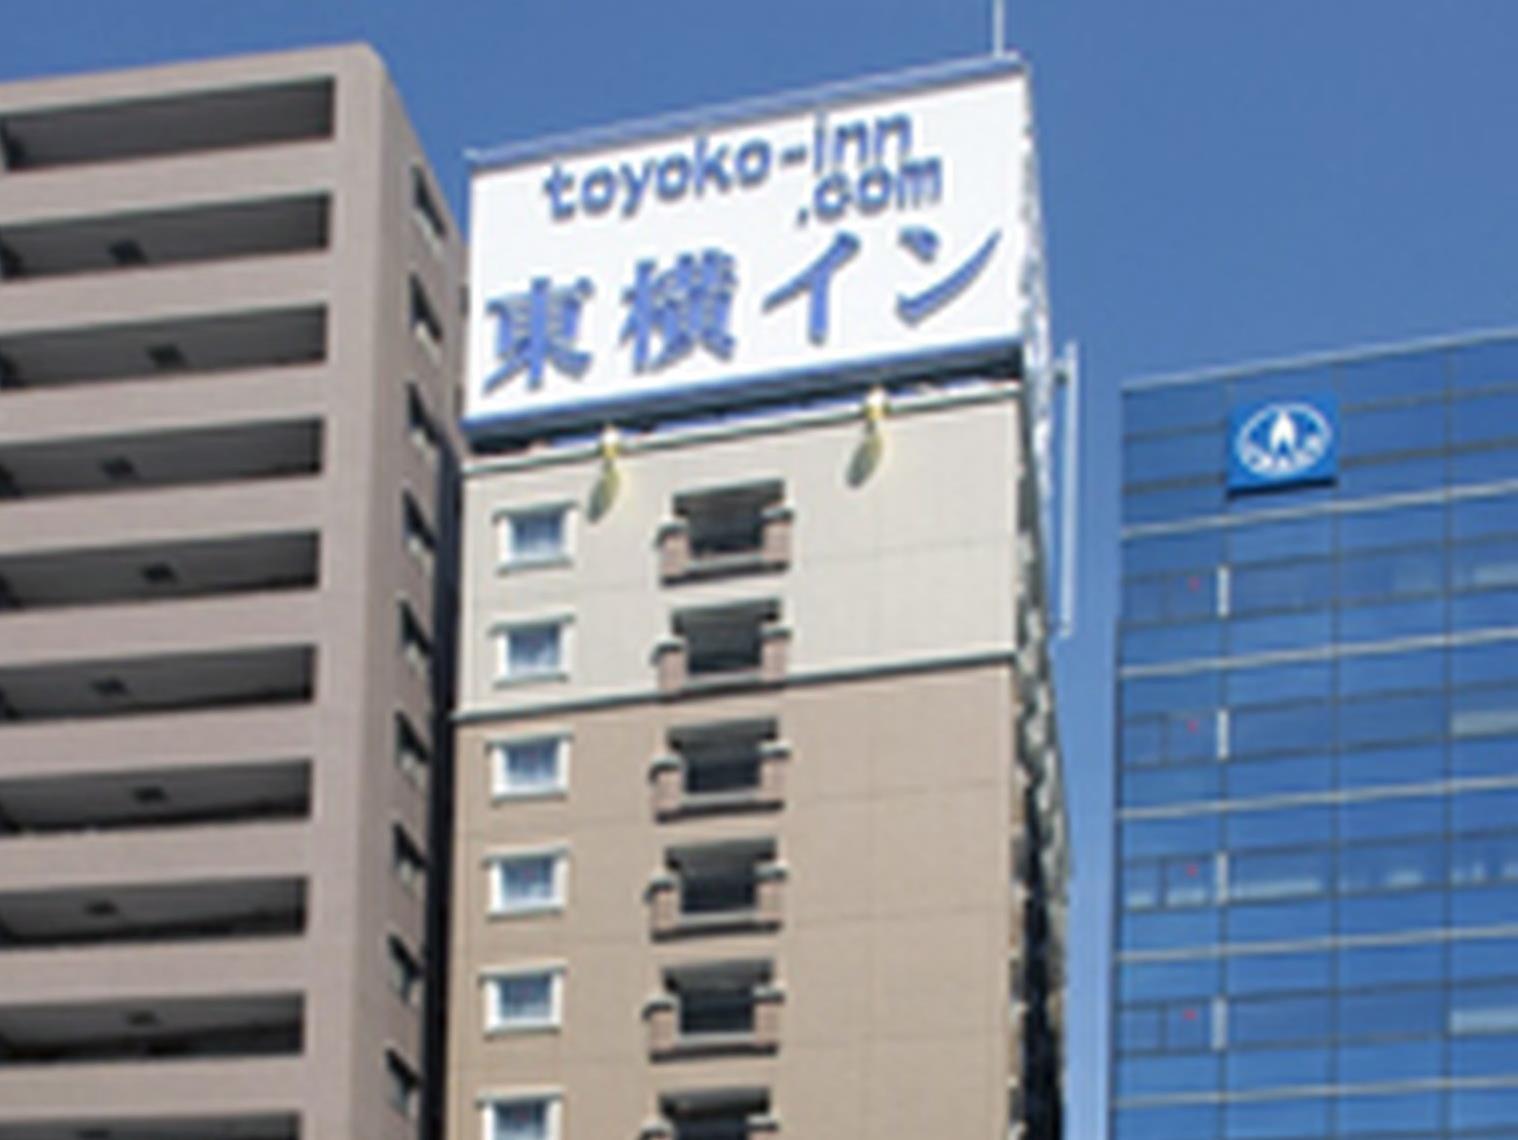 Toyoko Inn Tokyo Ueno Tawaramachi eki